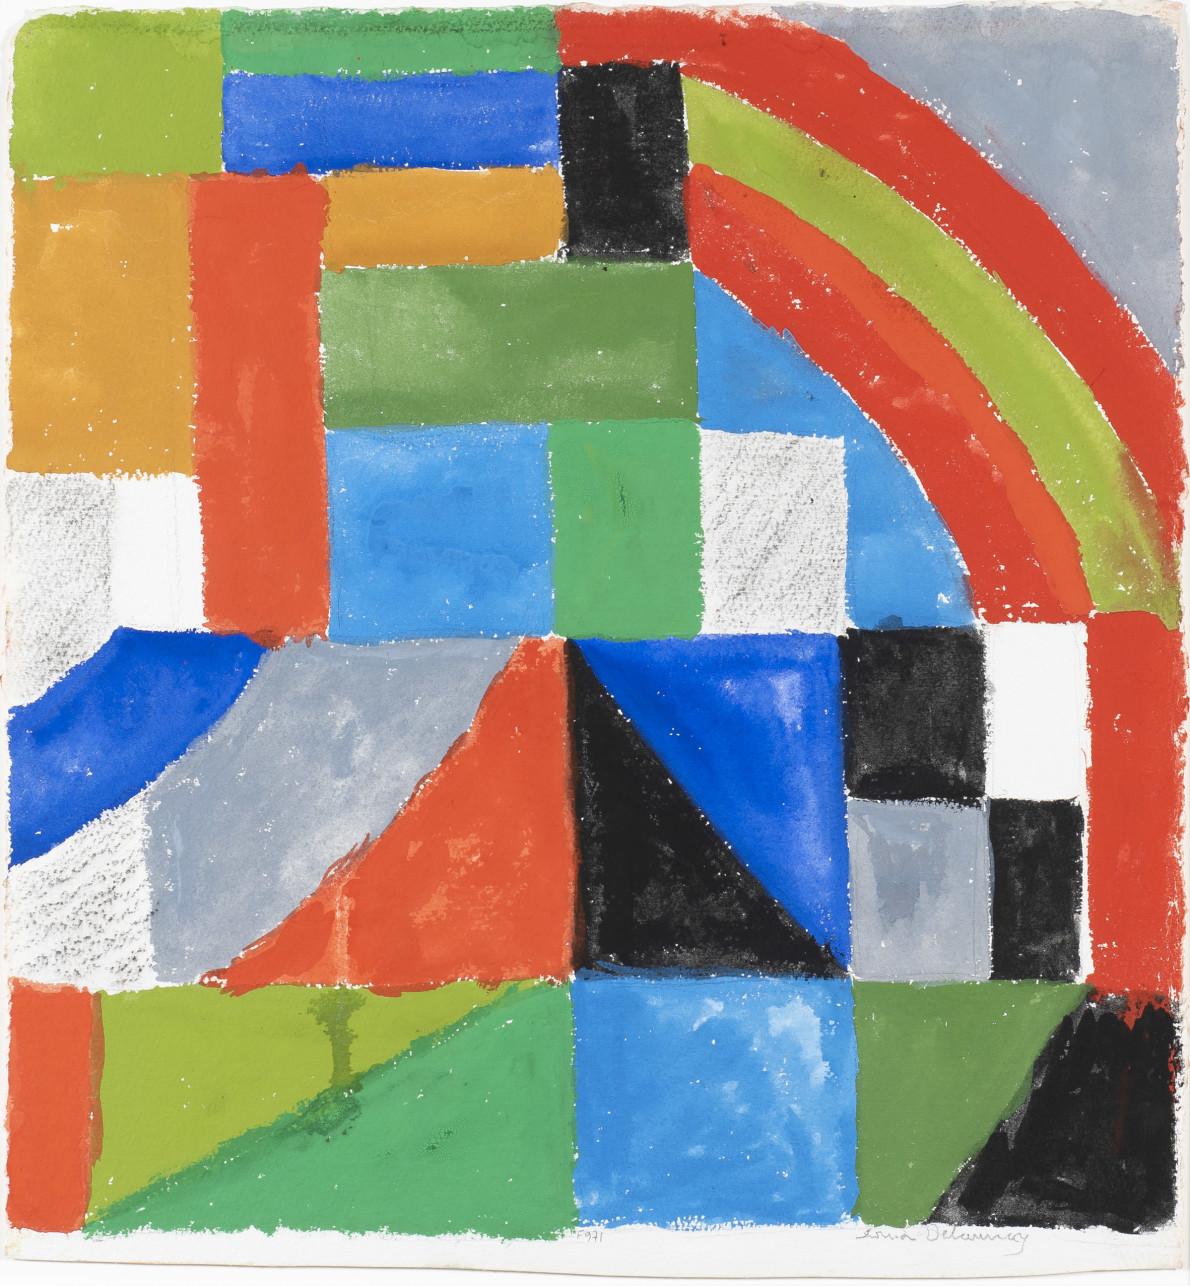 Sonia Delaunay, Rythme couleur, 1962